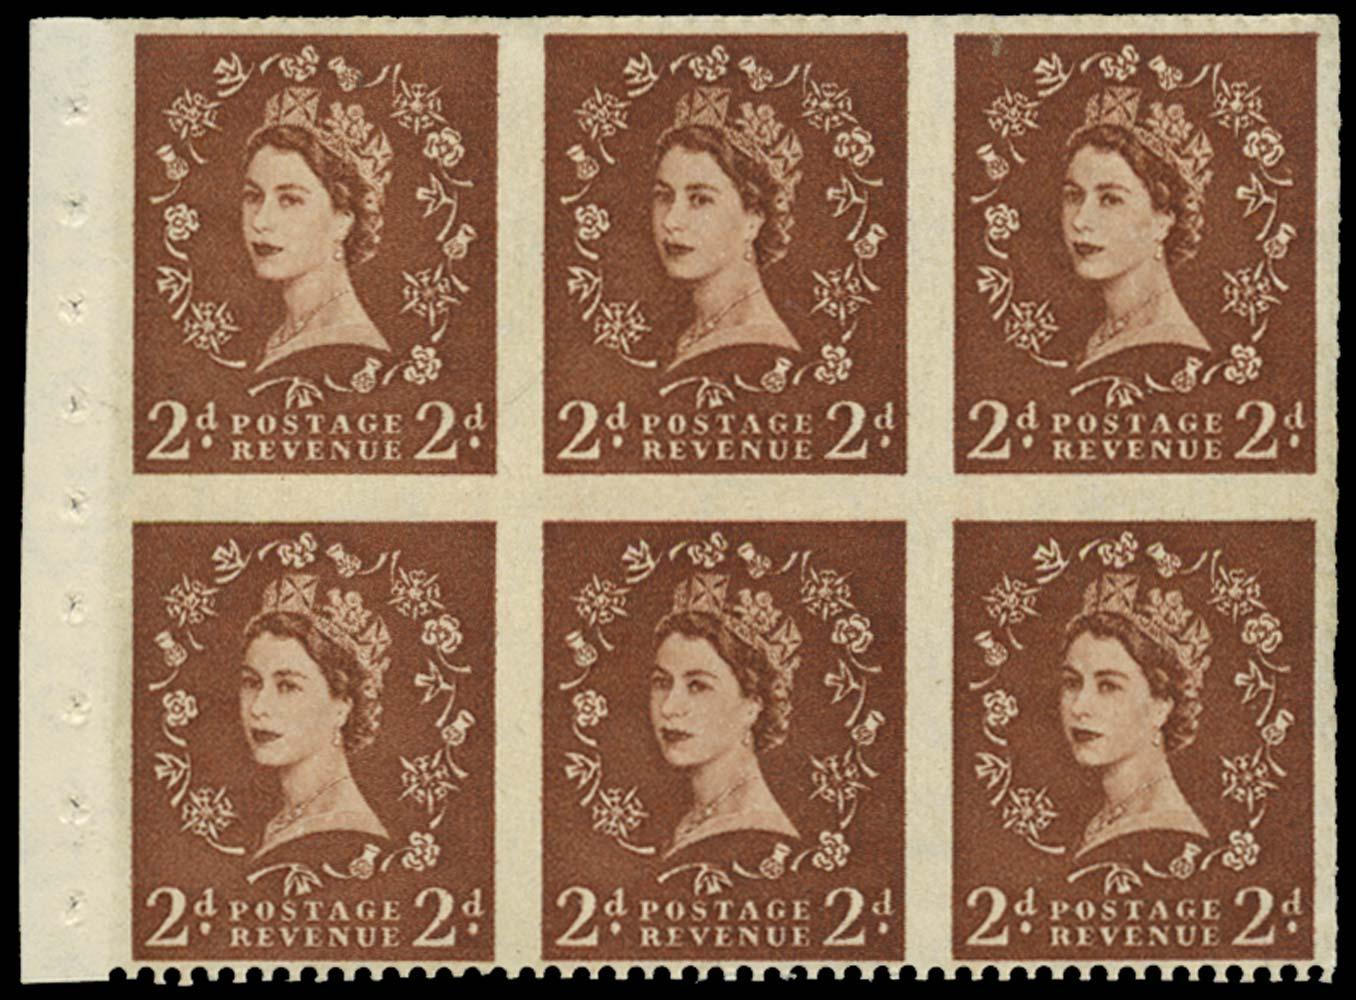 GB 1956  SG543blb Booklet pane - Imperforate